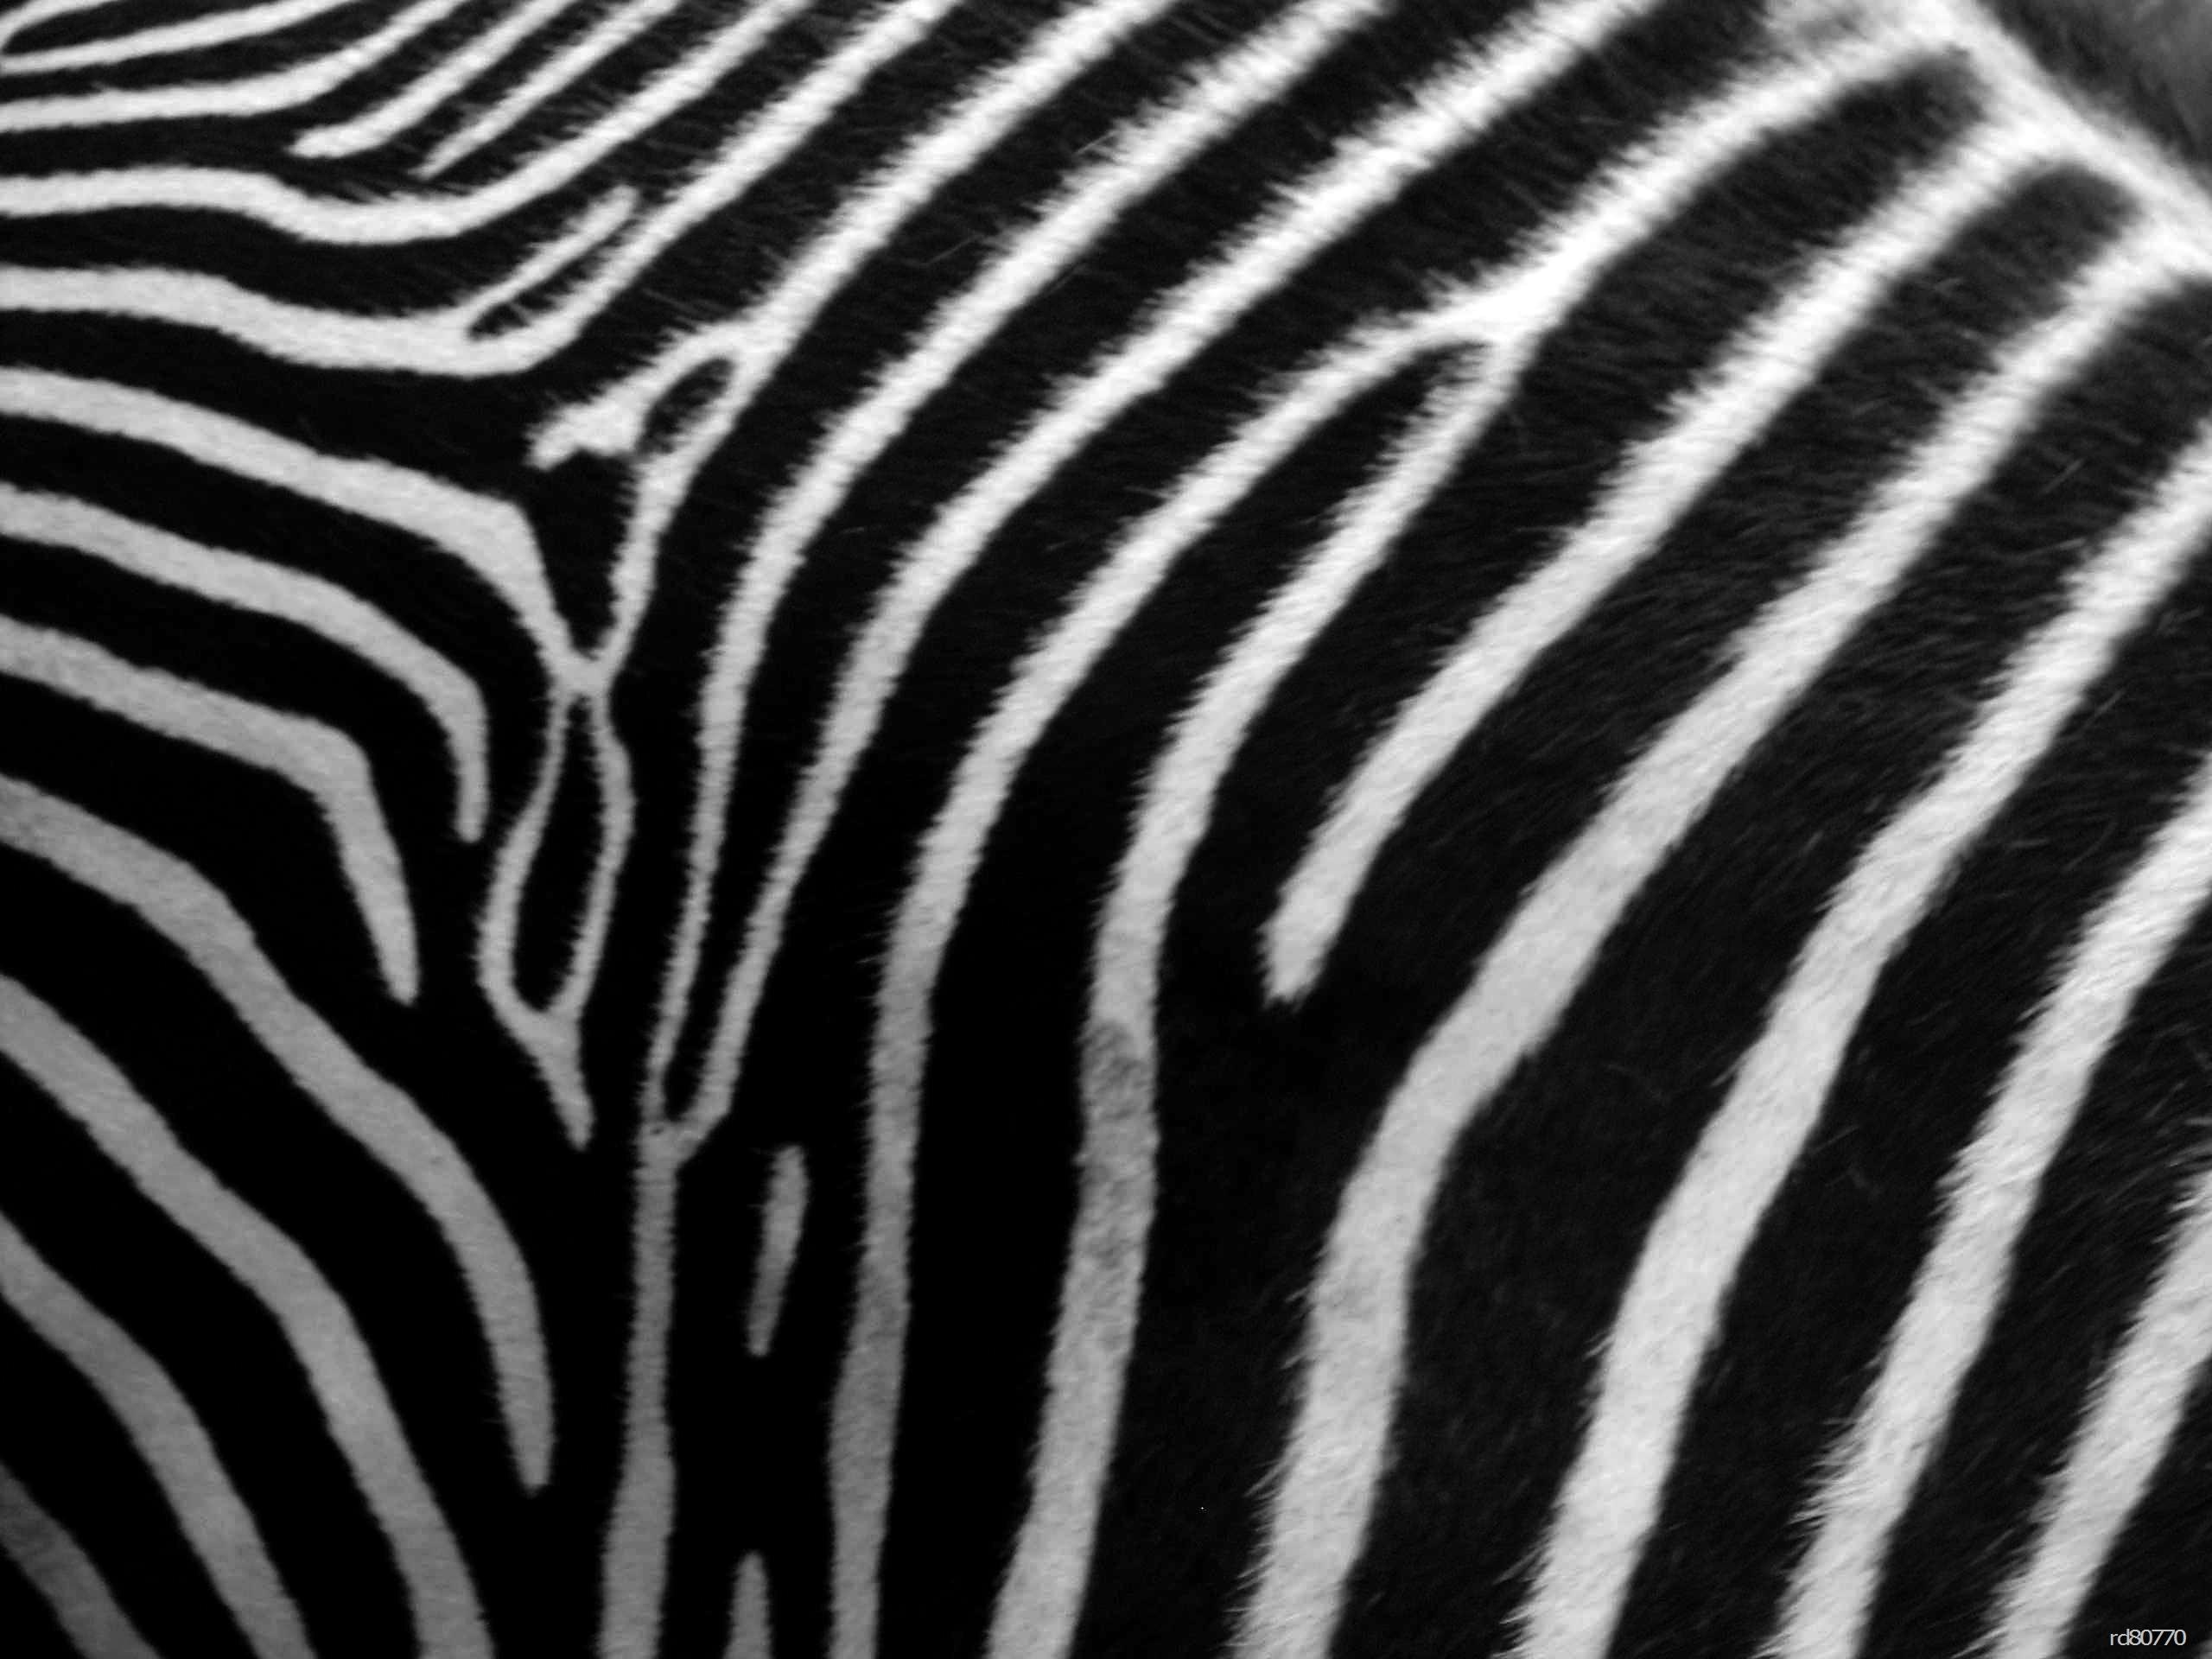 Zebra skin - photo#3